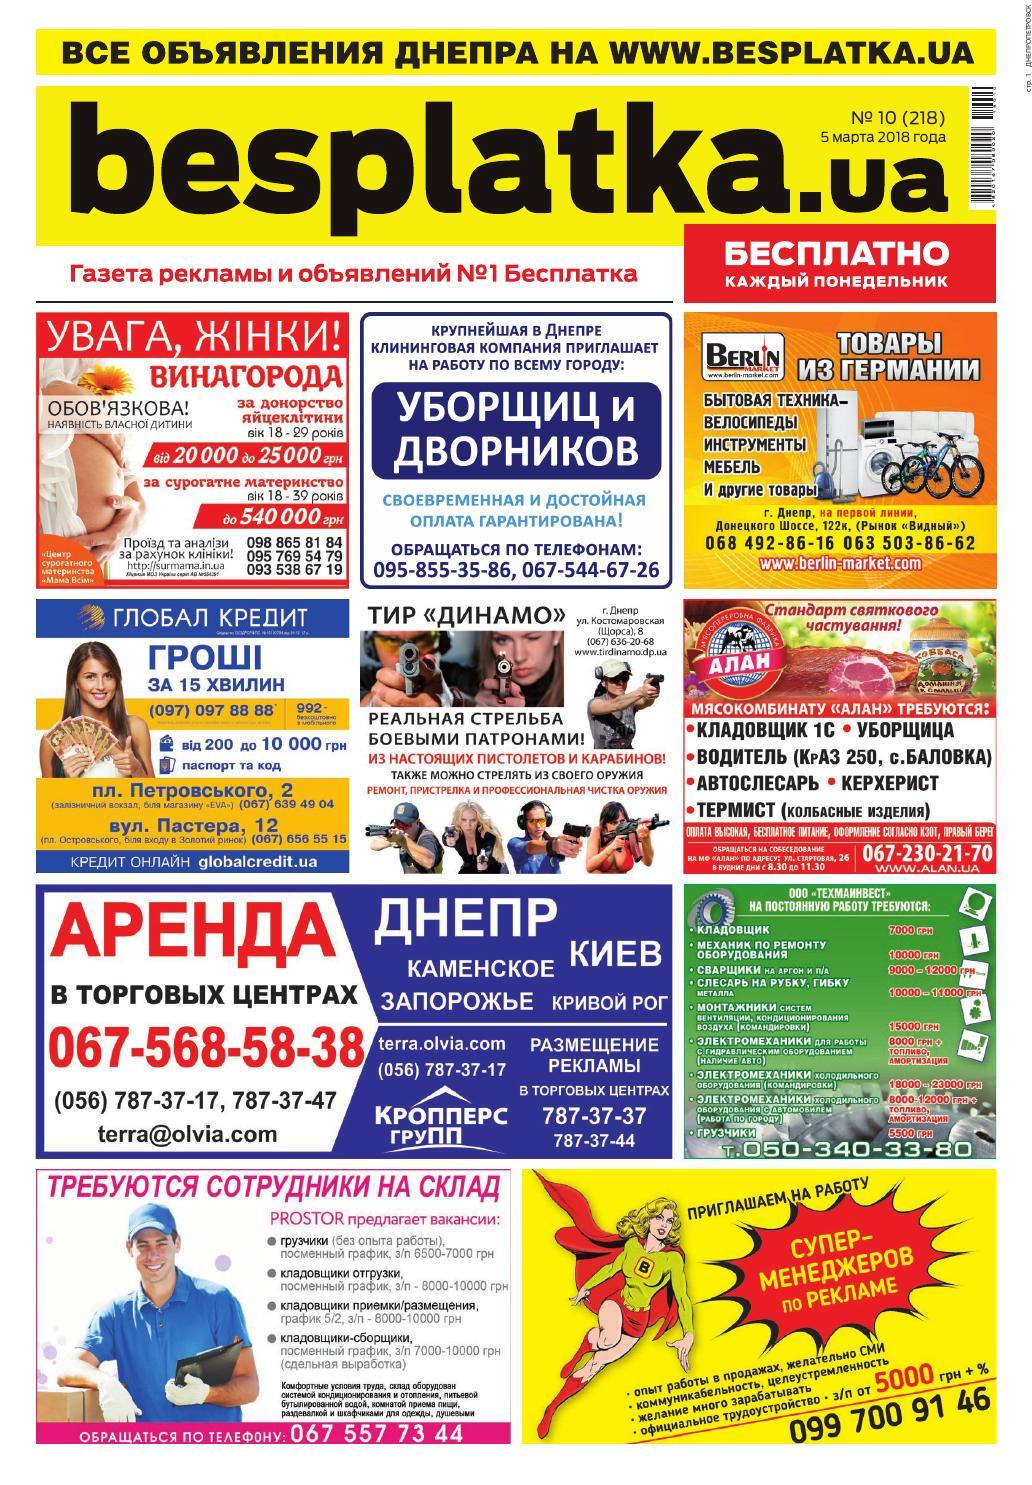 91756609e Besplatka #10 Днепр by besplatka ukraine - issuu